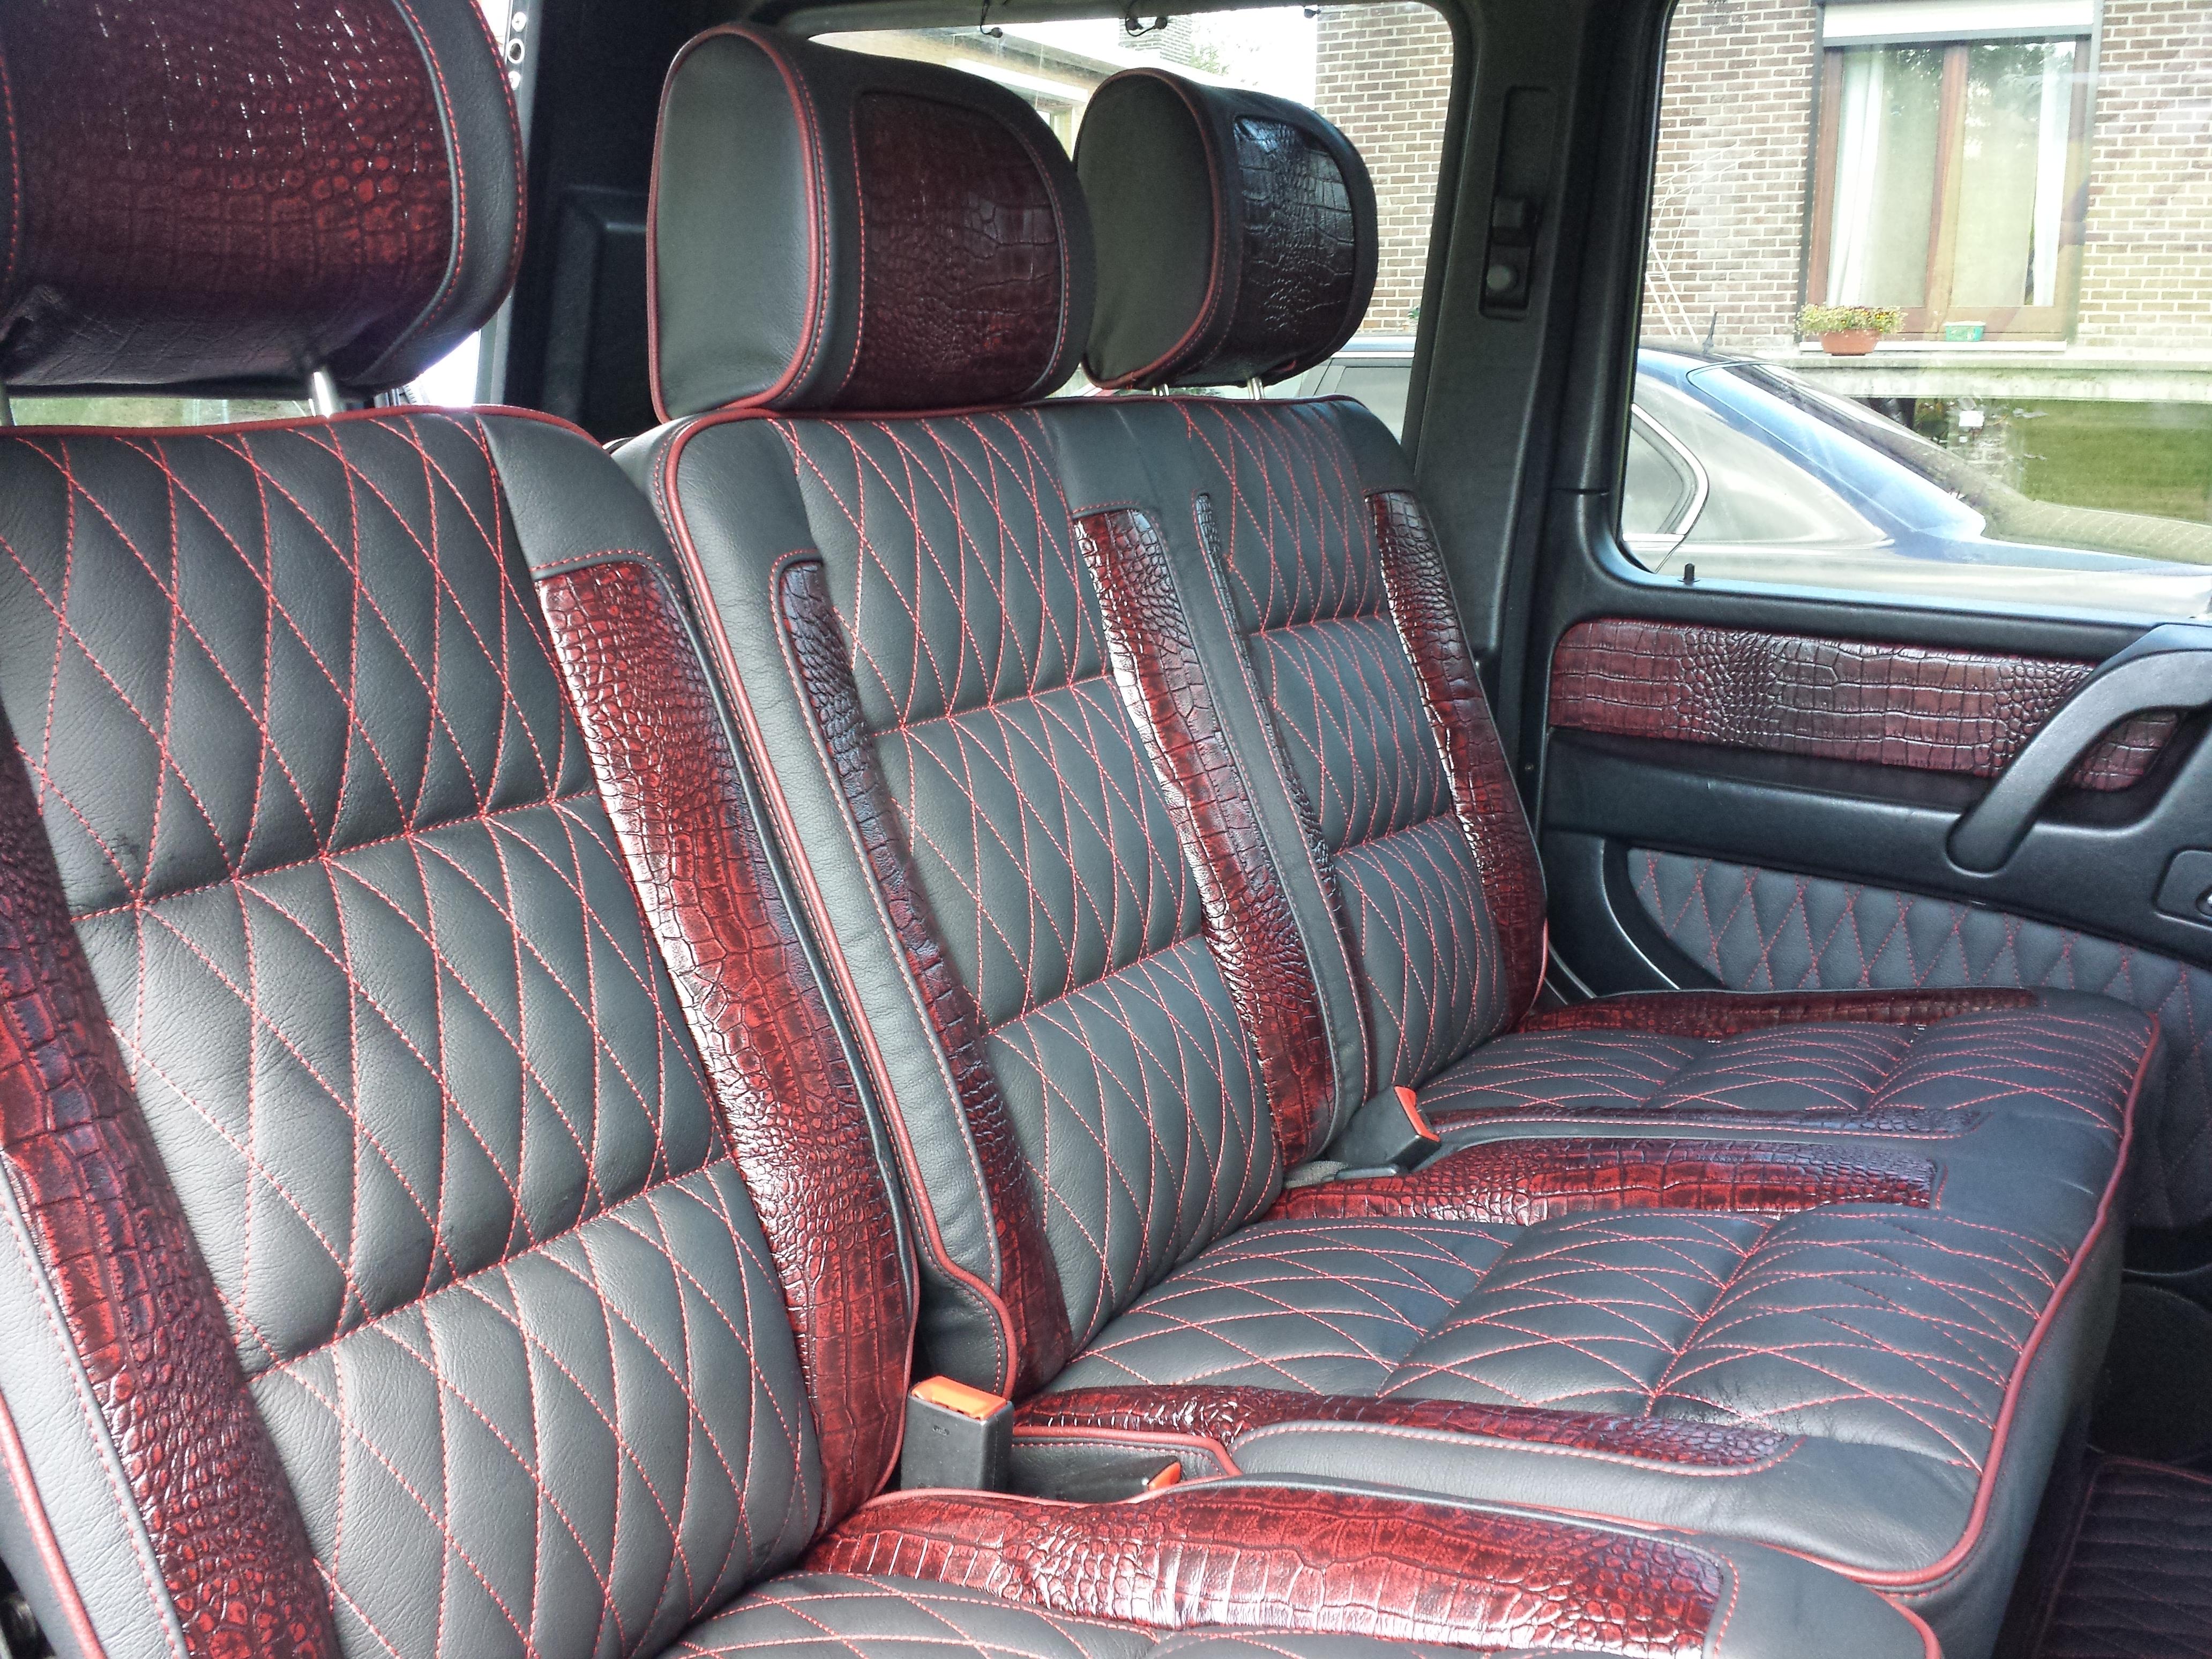 Corba design g wagon r r autobekleding for Auto interieur bekleden